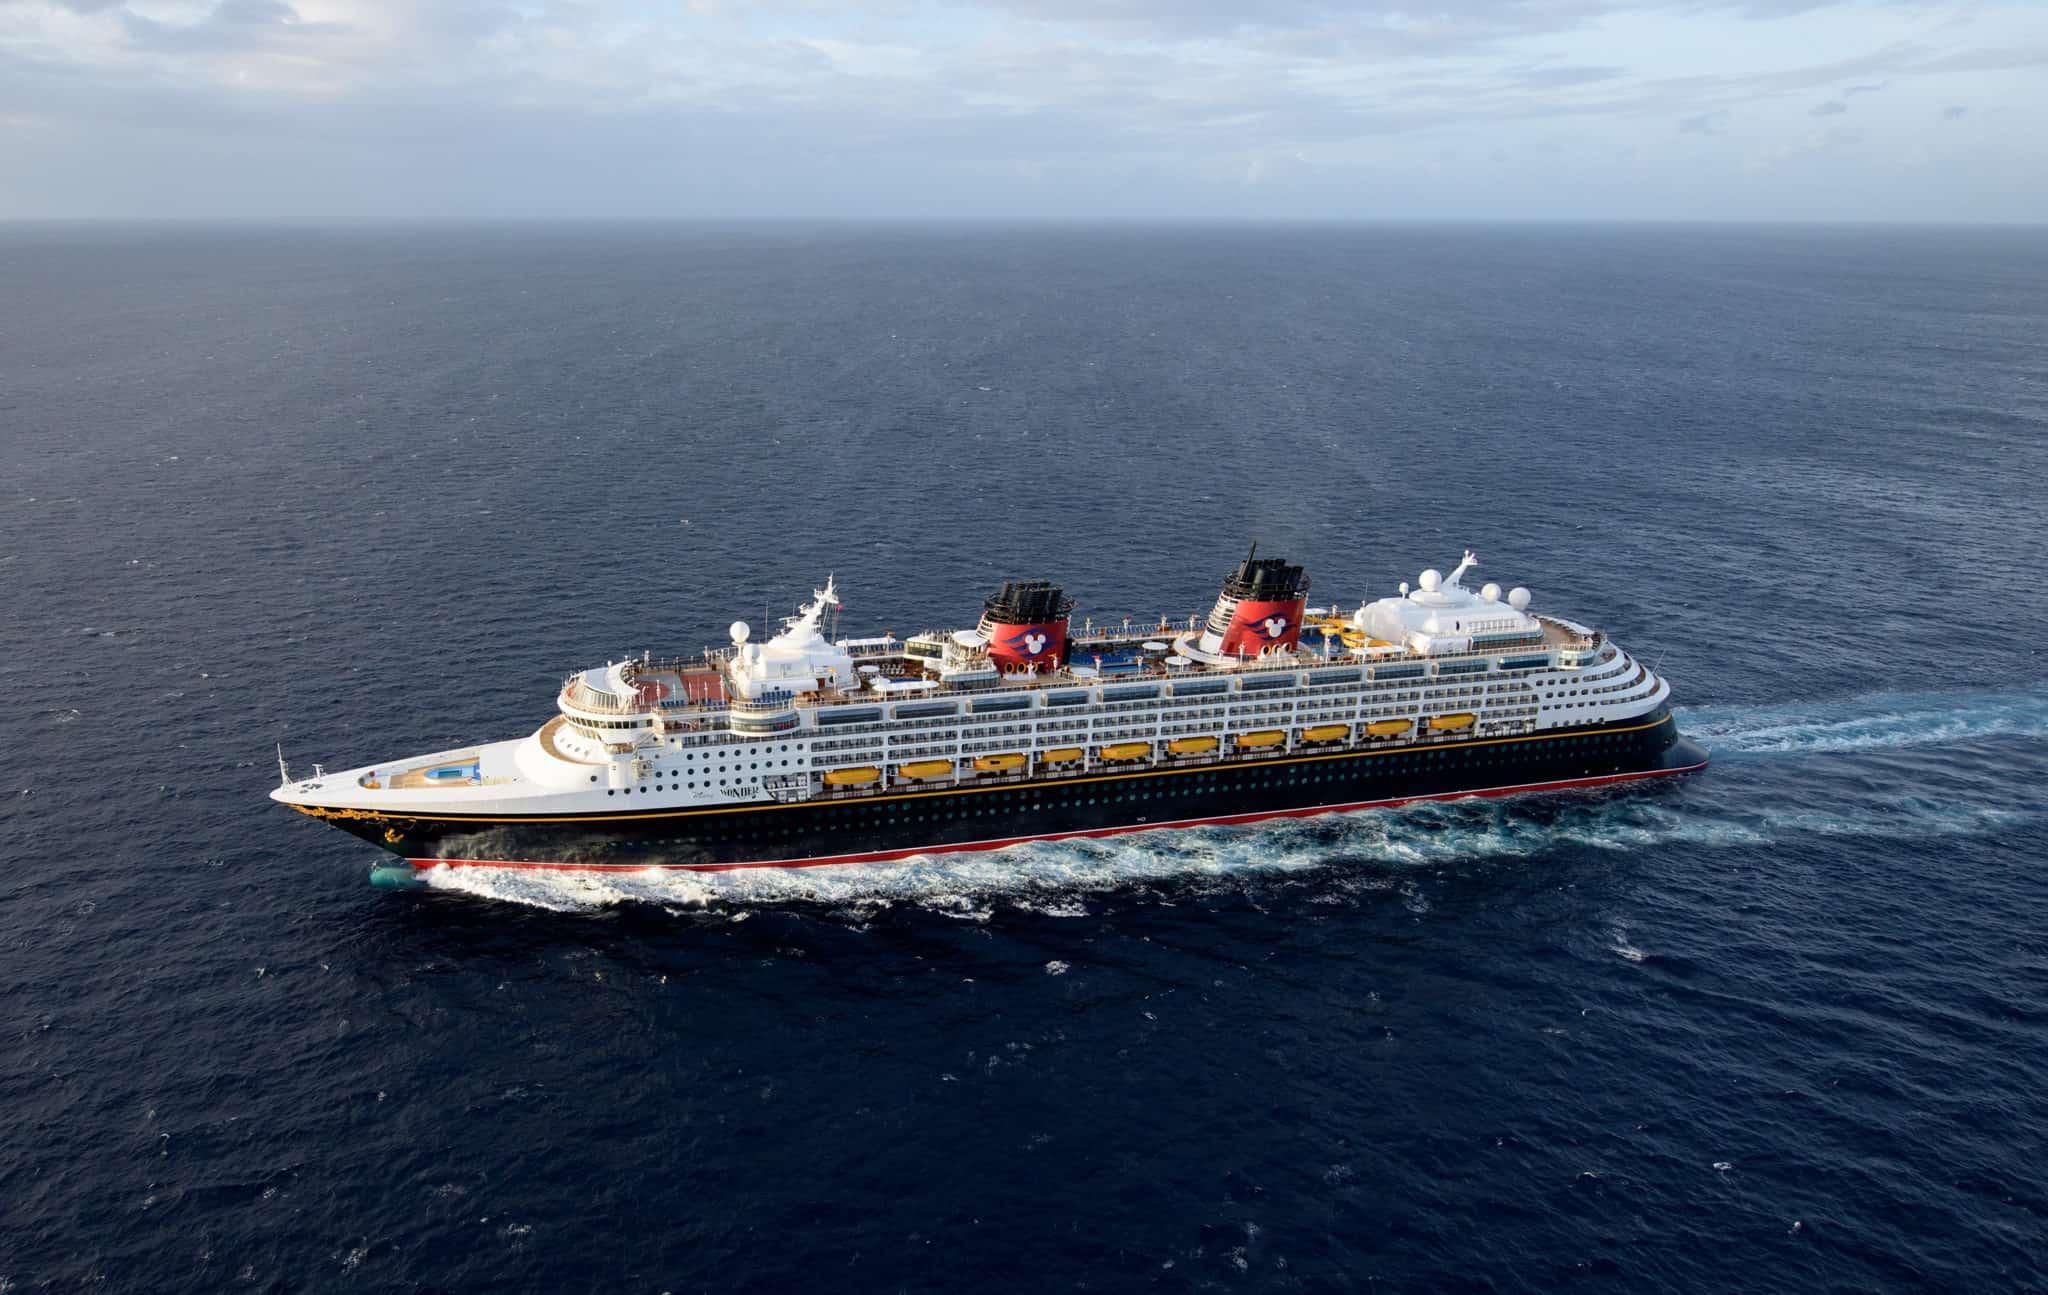 disney wonder aerial at sea